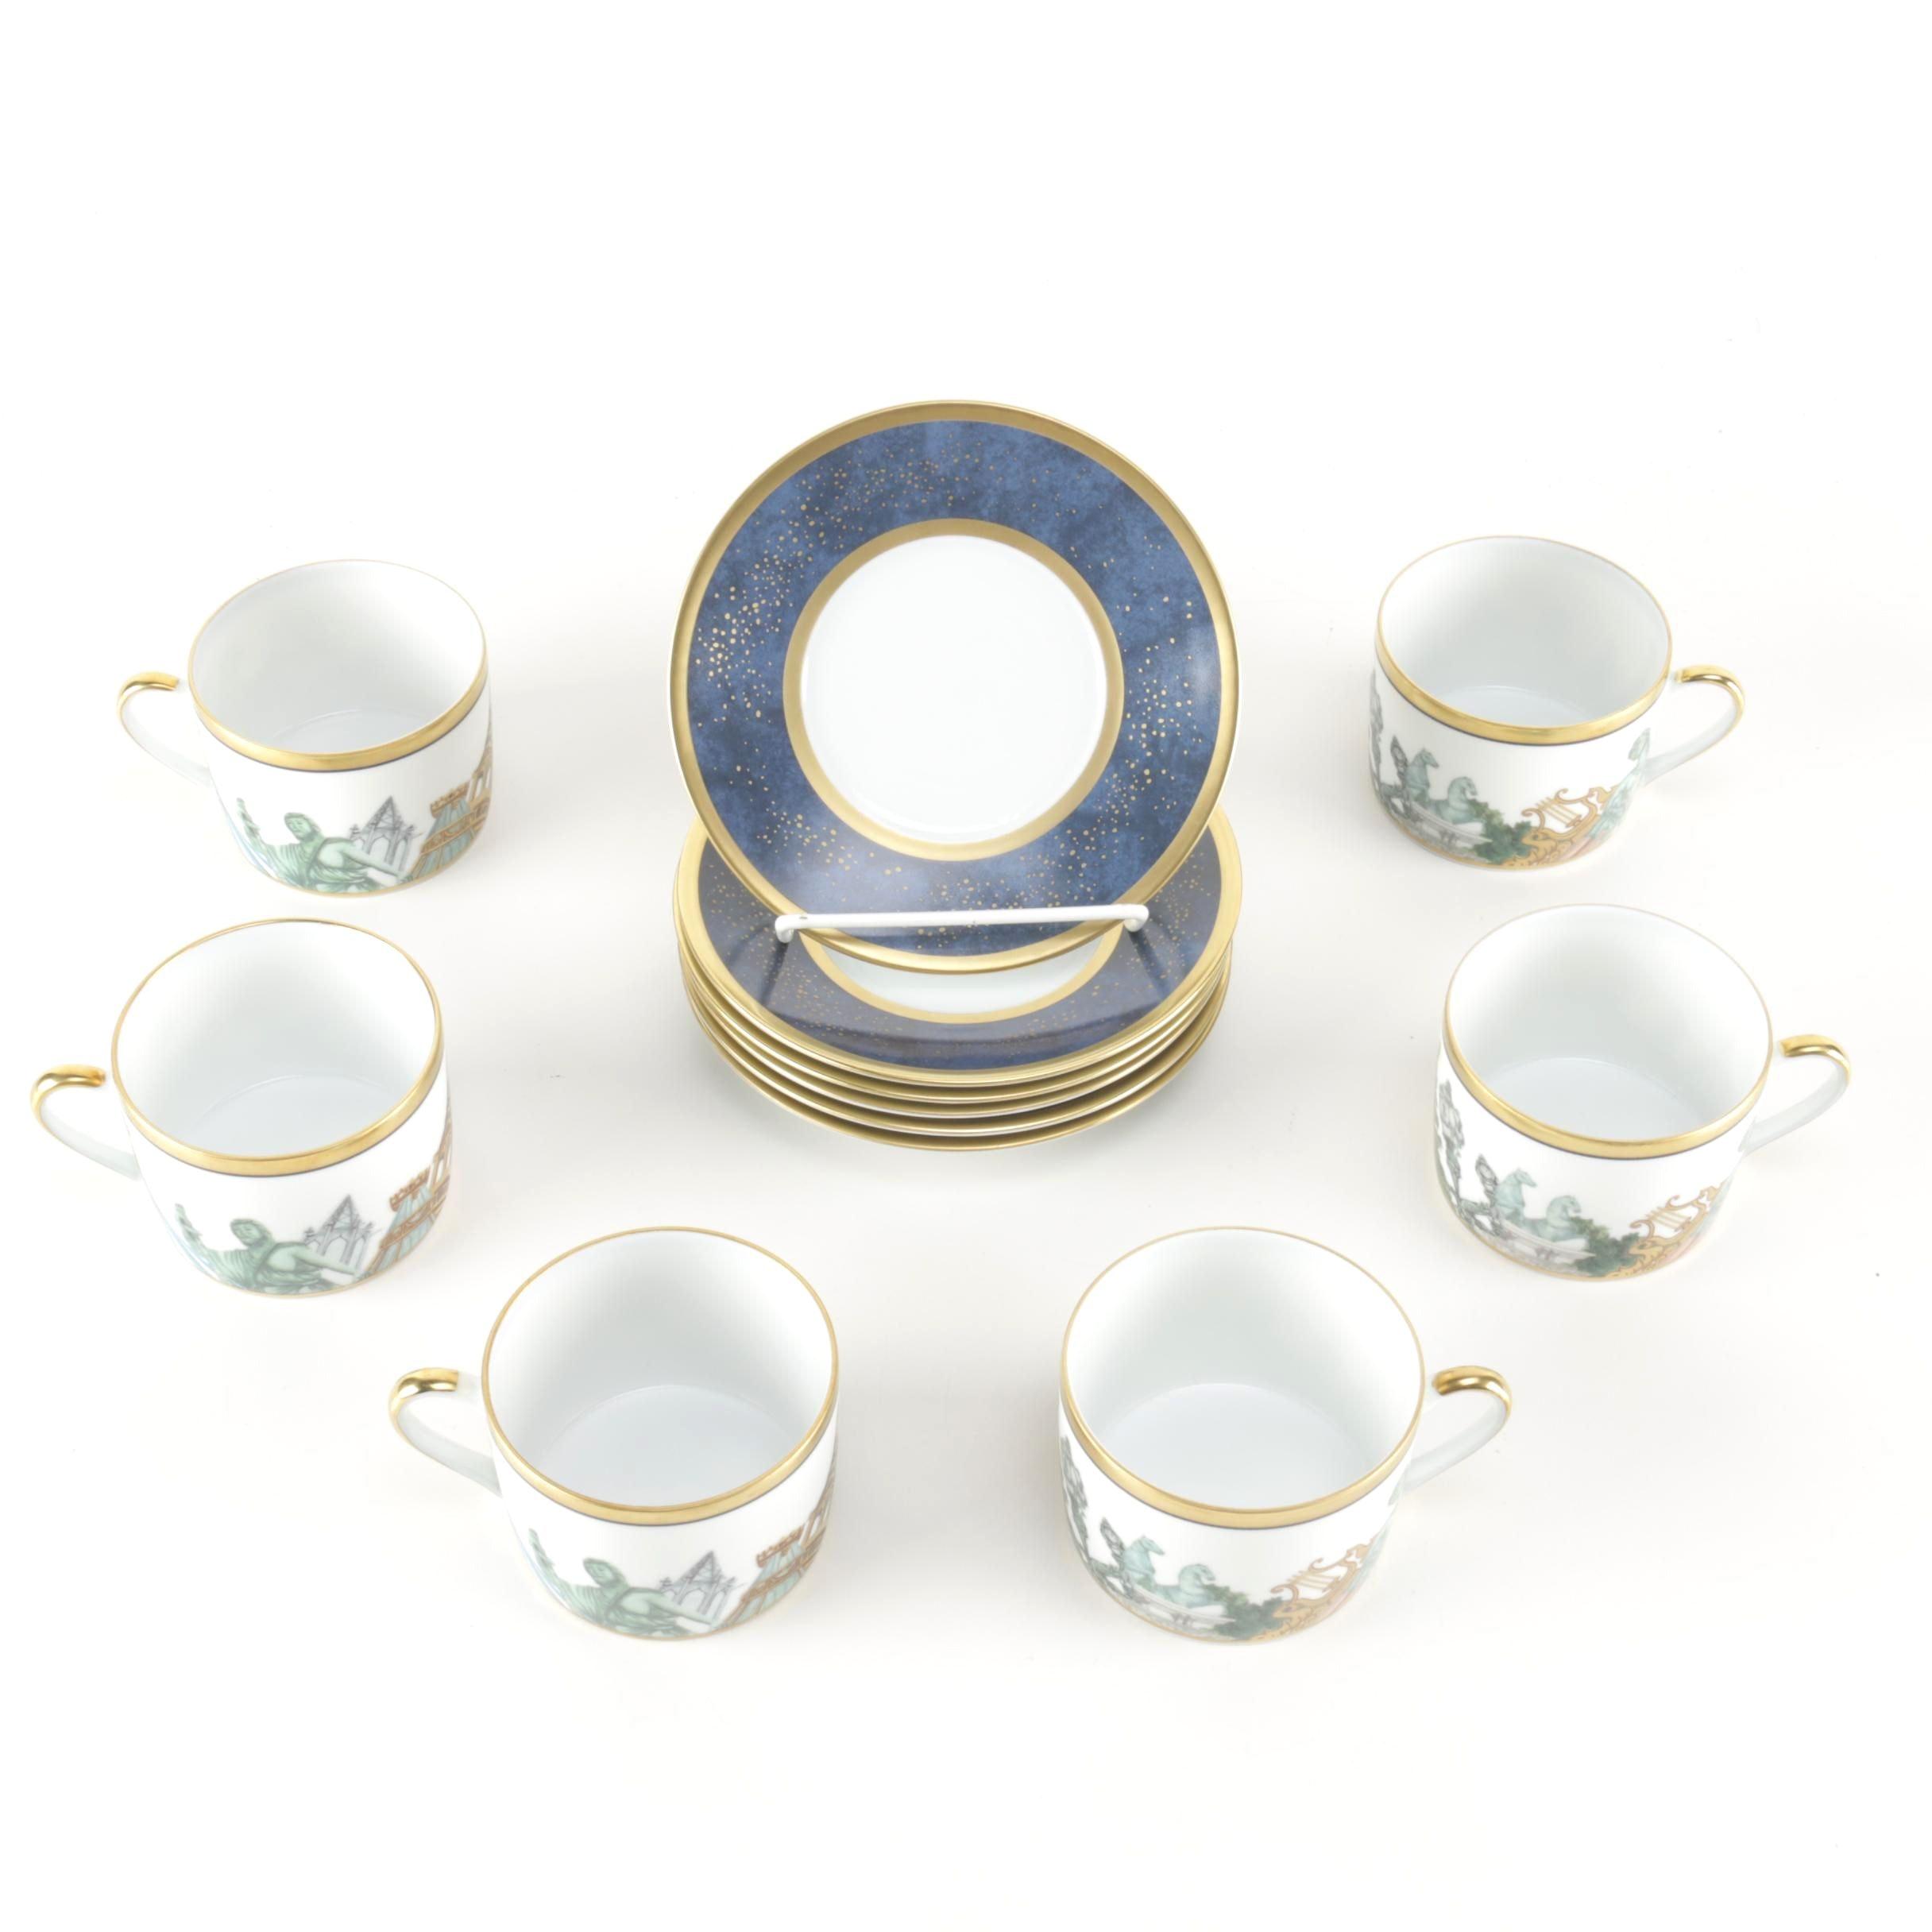 Bernaudaud by Limoges Tea Cups and Saucers